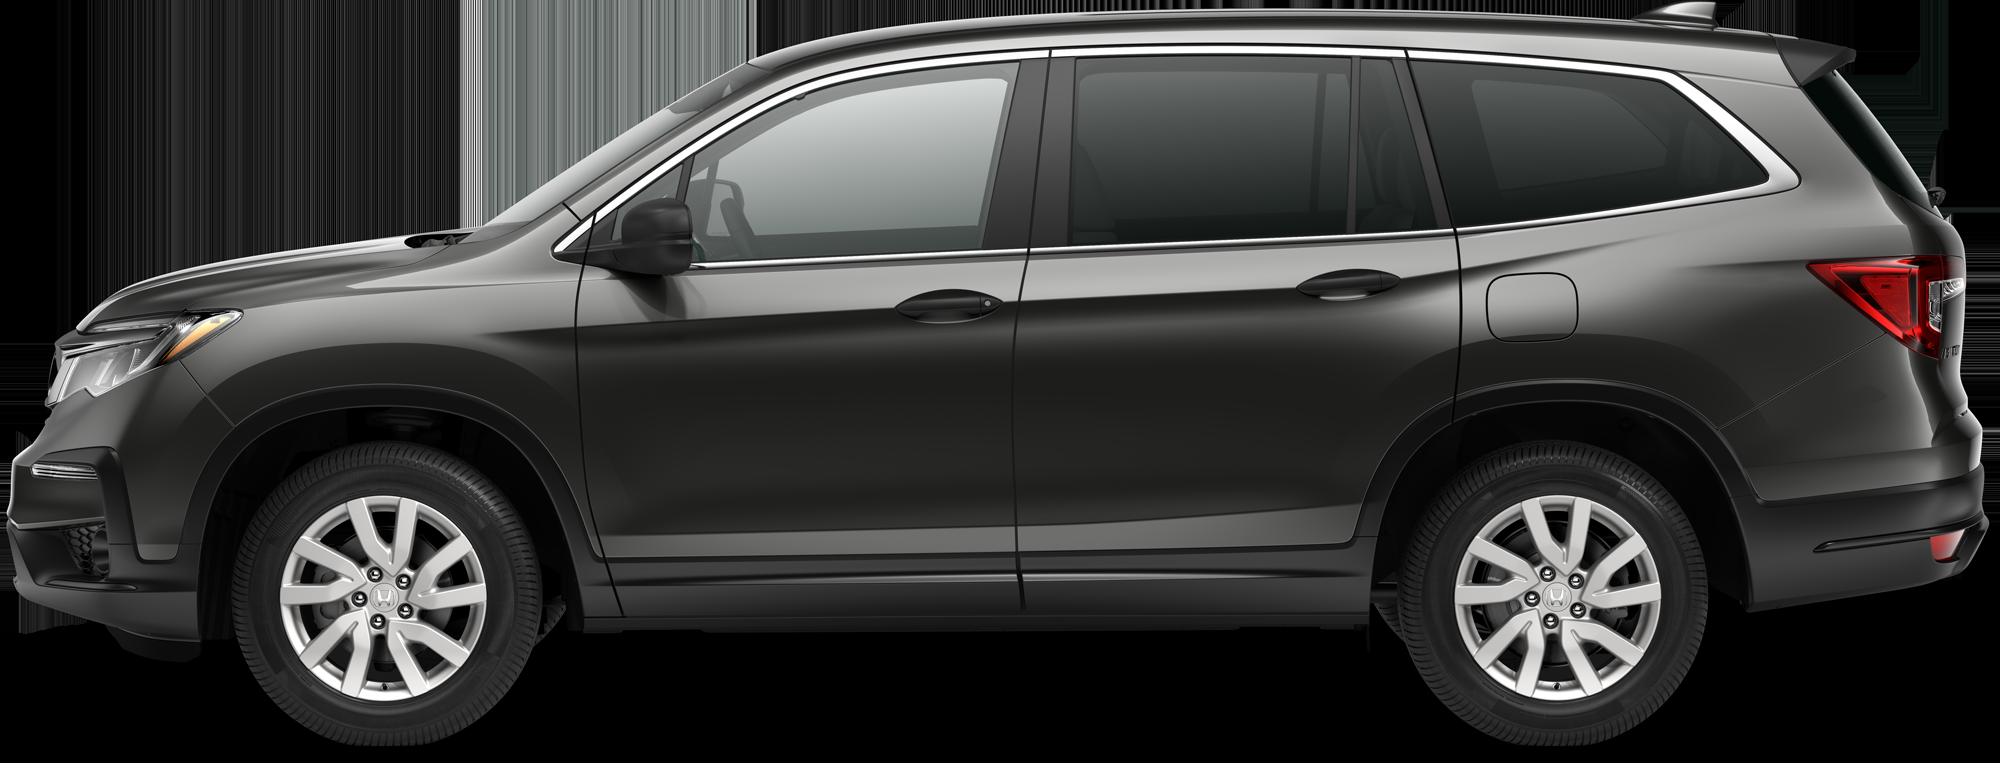 2021 Honda Pilot SUV LX